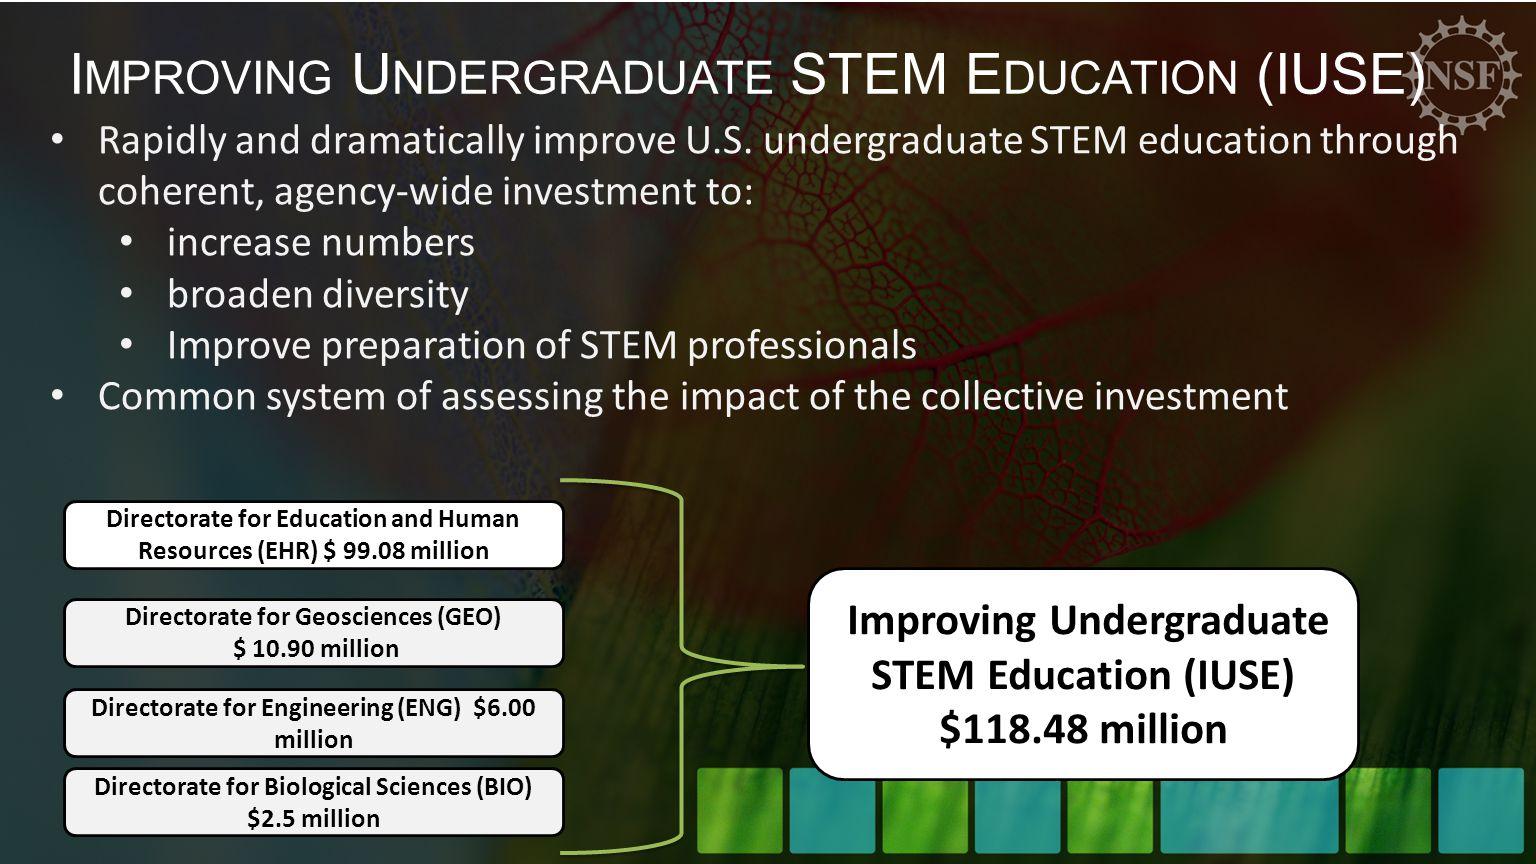 I MPROVING U NDERGRADUATE STEM E DUCATION (IUSE) Improving Undergraduate STEM Education (IUSE) $118.48 million Directorate for Education and Human Resources (EHR) $ 99.08 million Directorate for Biological Sciences (BIO) $2.5 million Directorate for Geosciences (GEO) $ 10.90 million Directorate for Engineering (ENG) $6.00 million Rapidly and dramatically improve U.S.